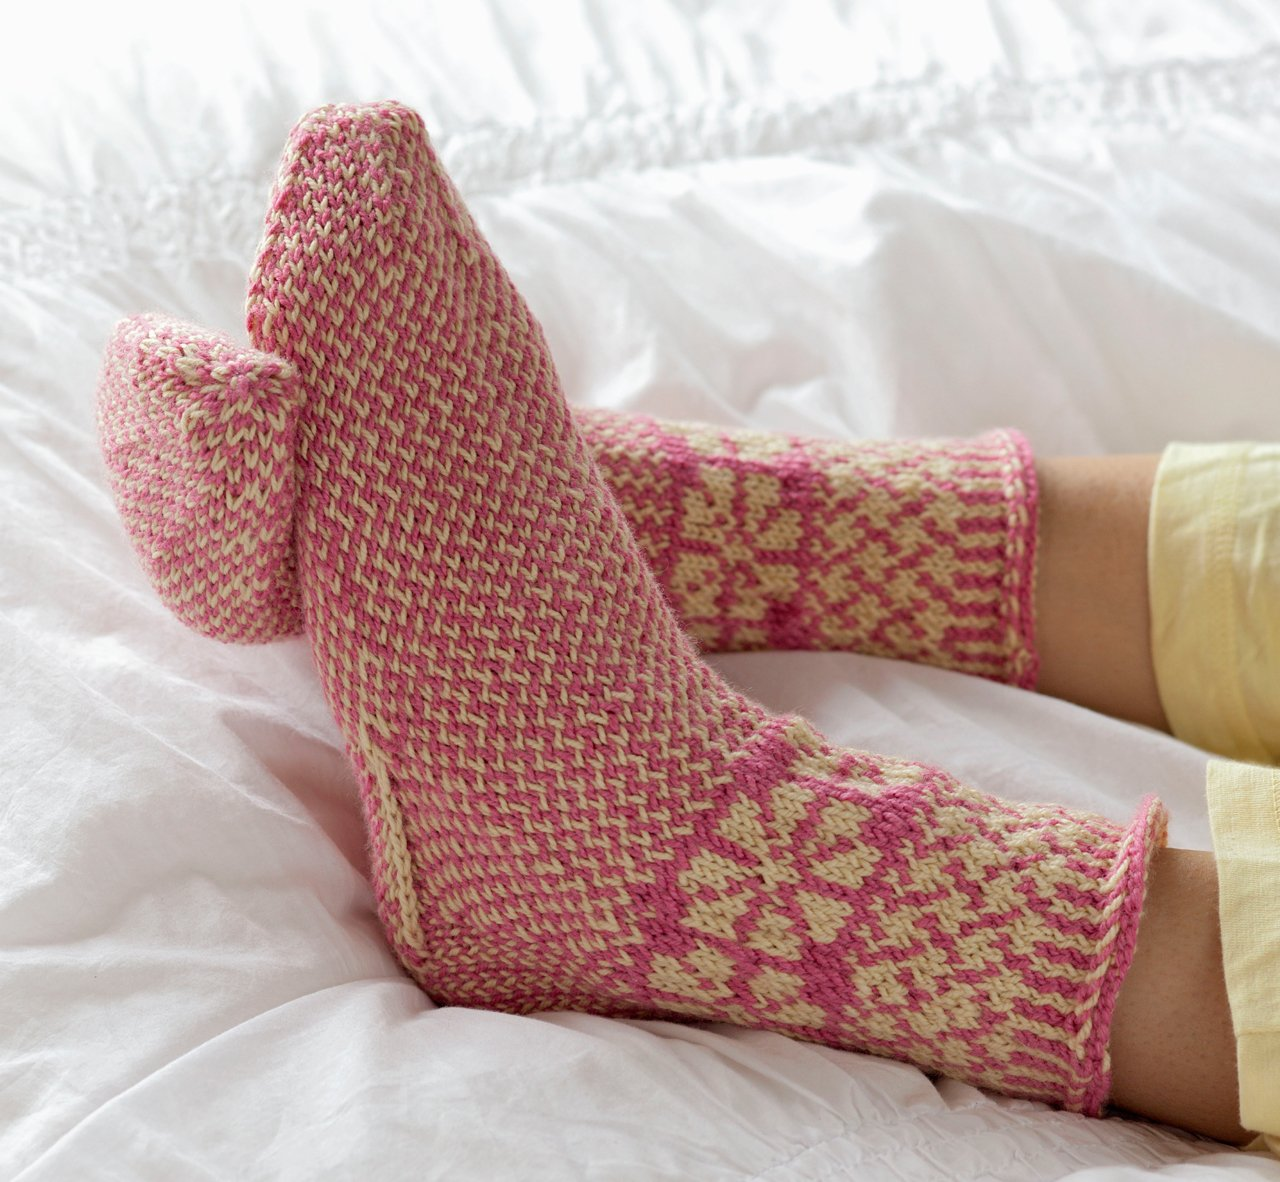 Knitting Scandinavian Slippers and Socks: Laura Farson ...